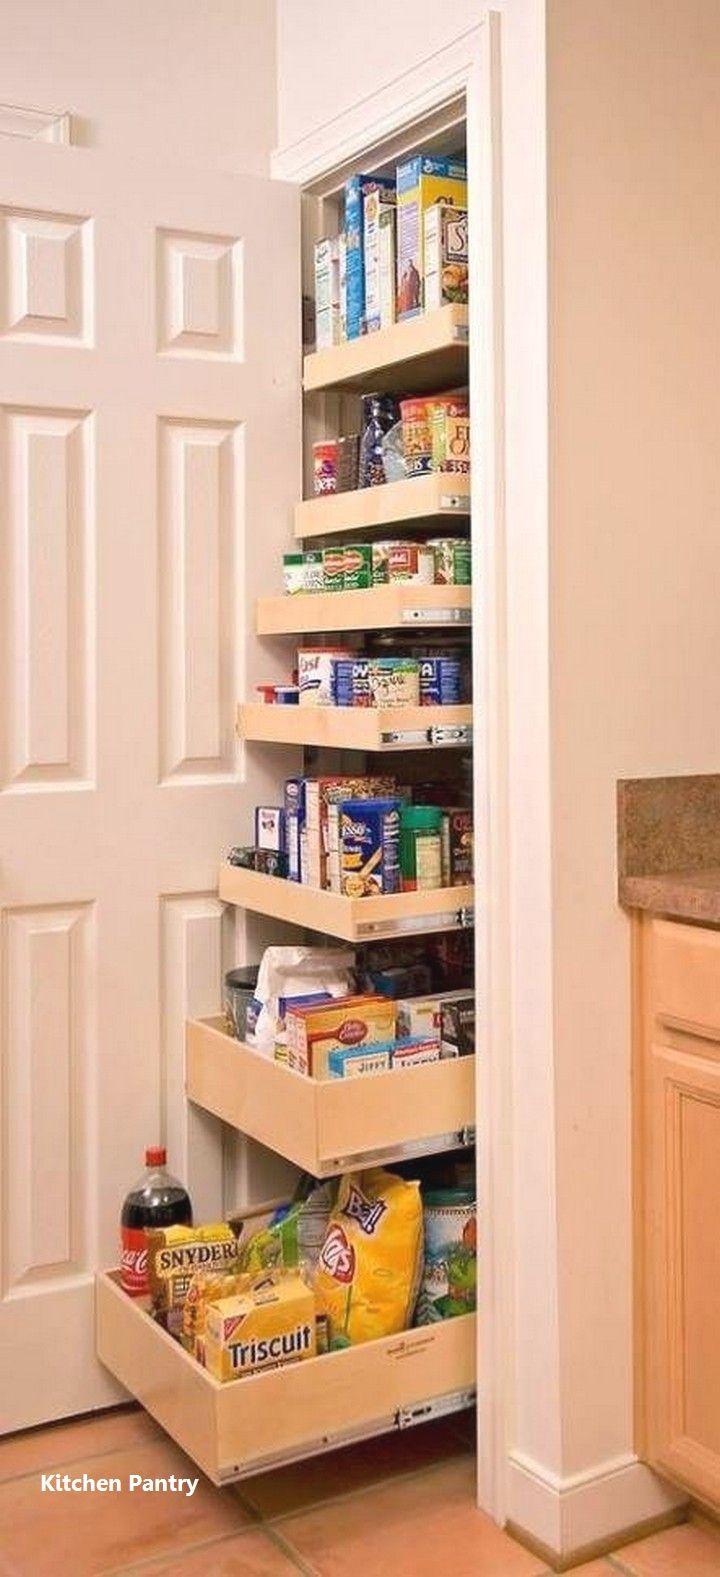 New Kitchen Pantry Ideas In 2020 Space Saving Kitchen Pantry Design Pantry Shelving